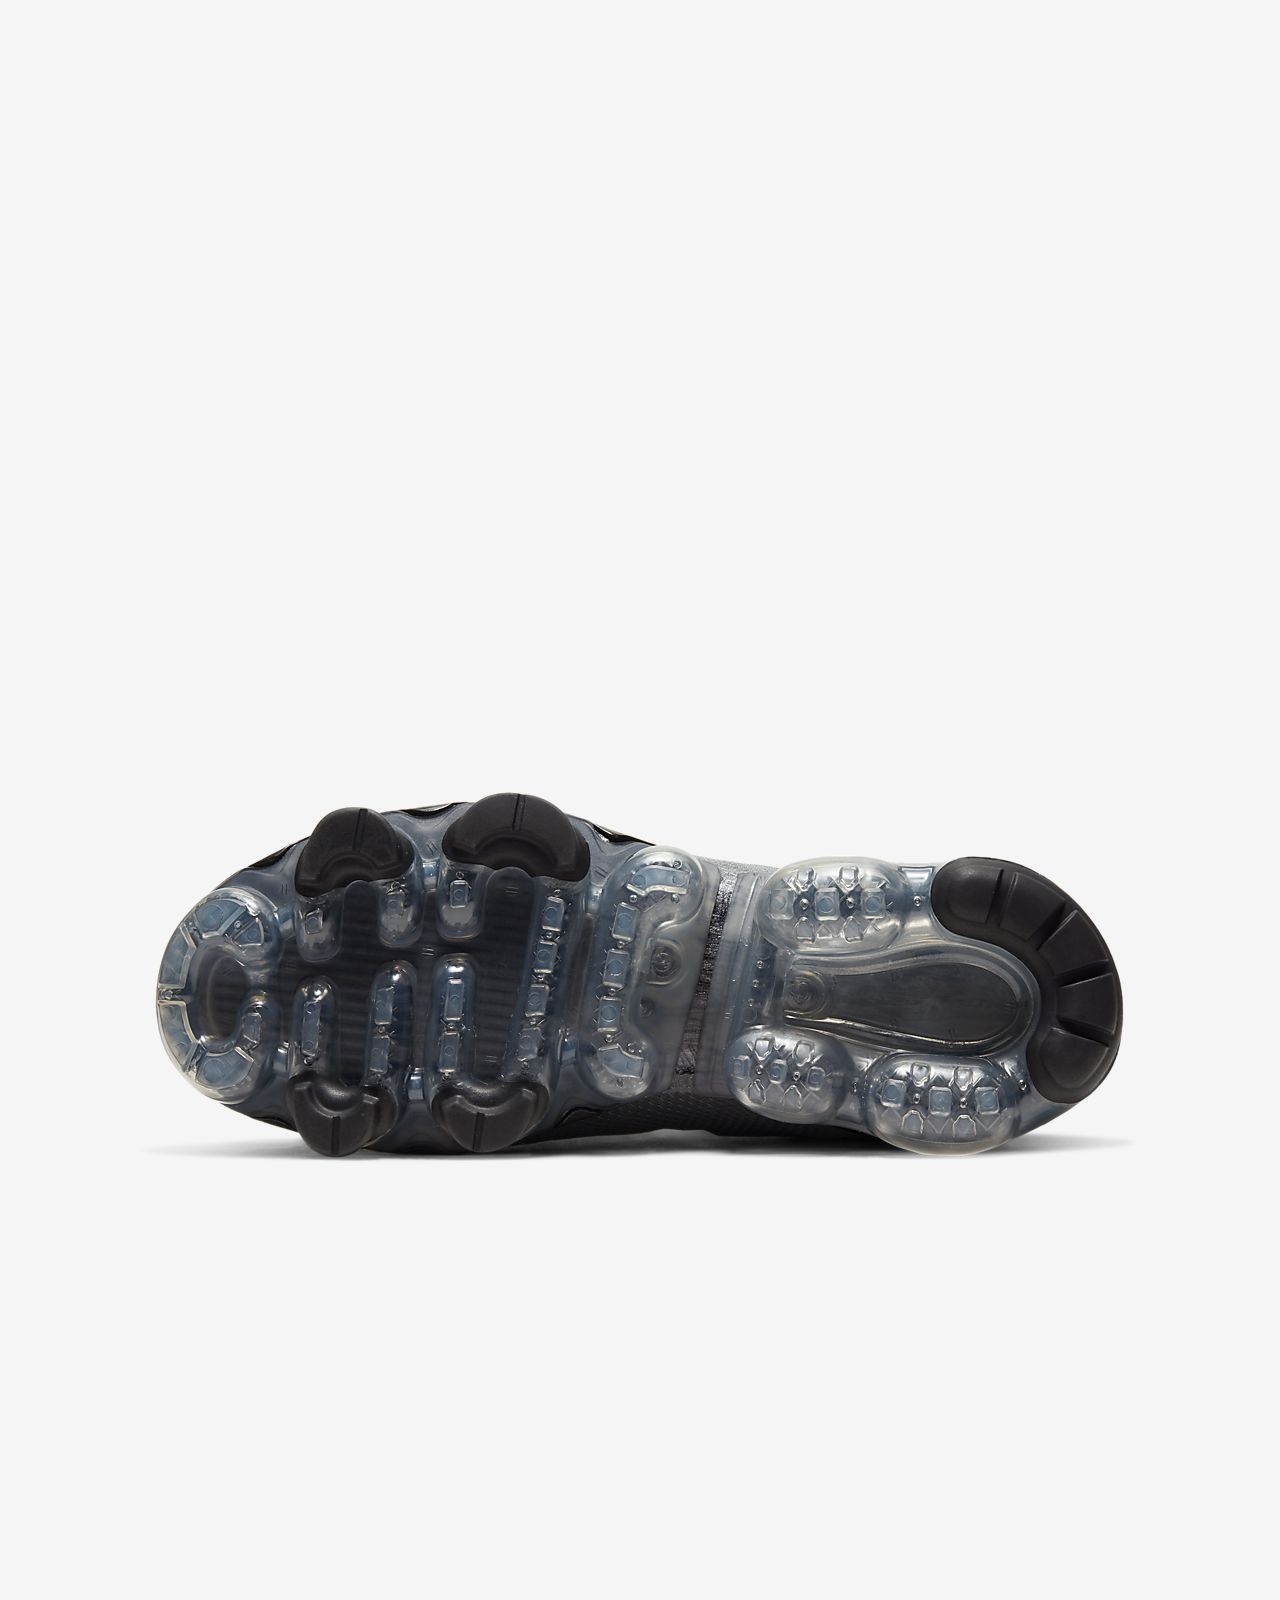 Sapatilhas Nike Air VaporMax 2019 Júnior